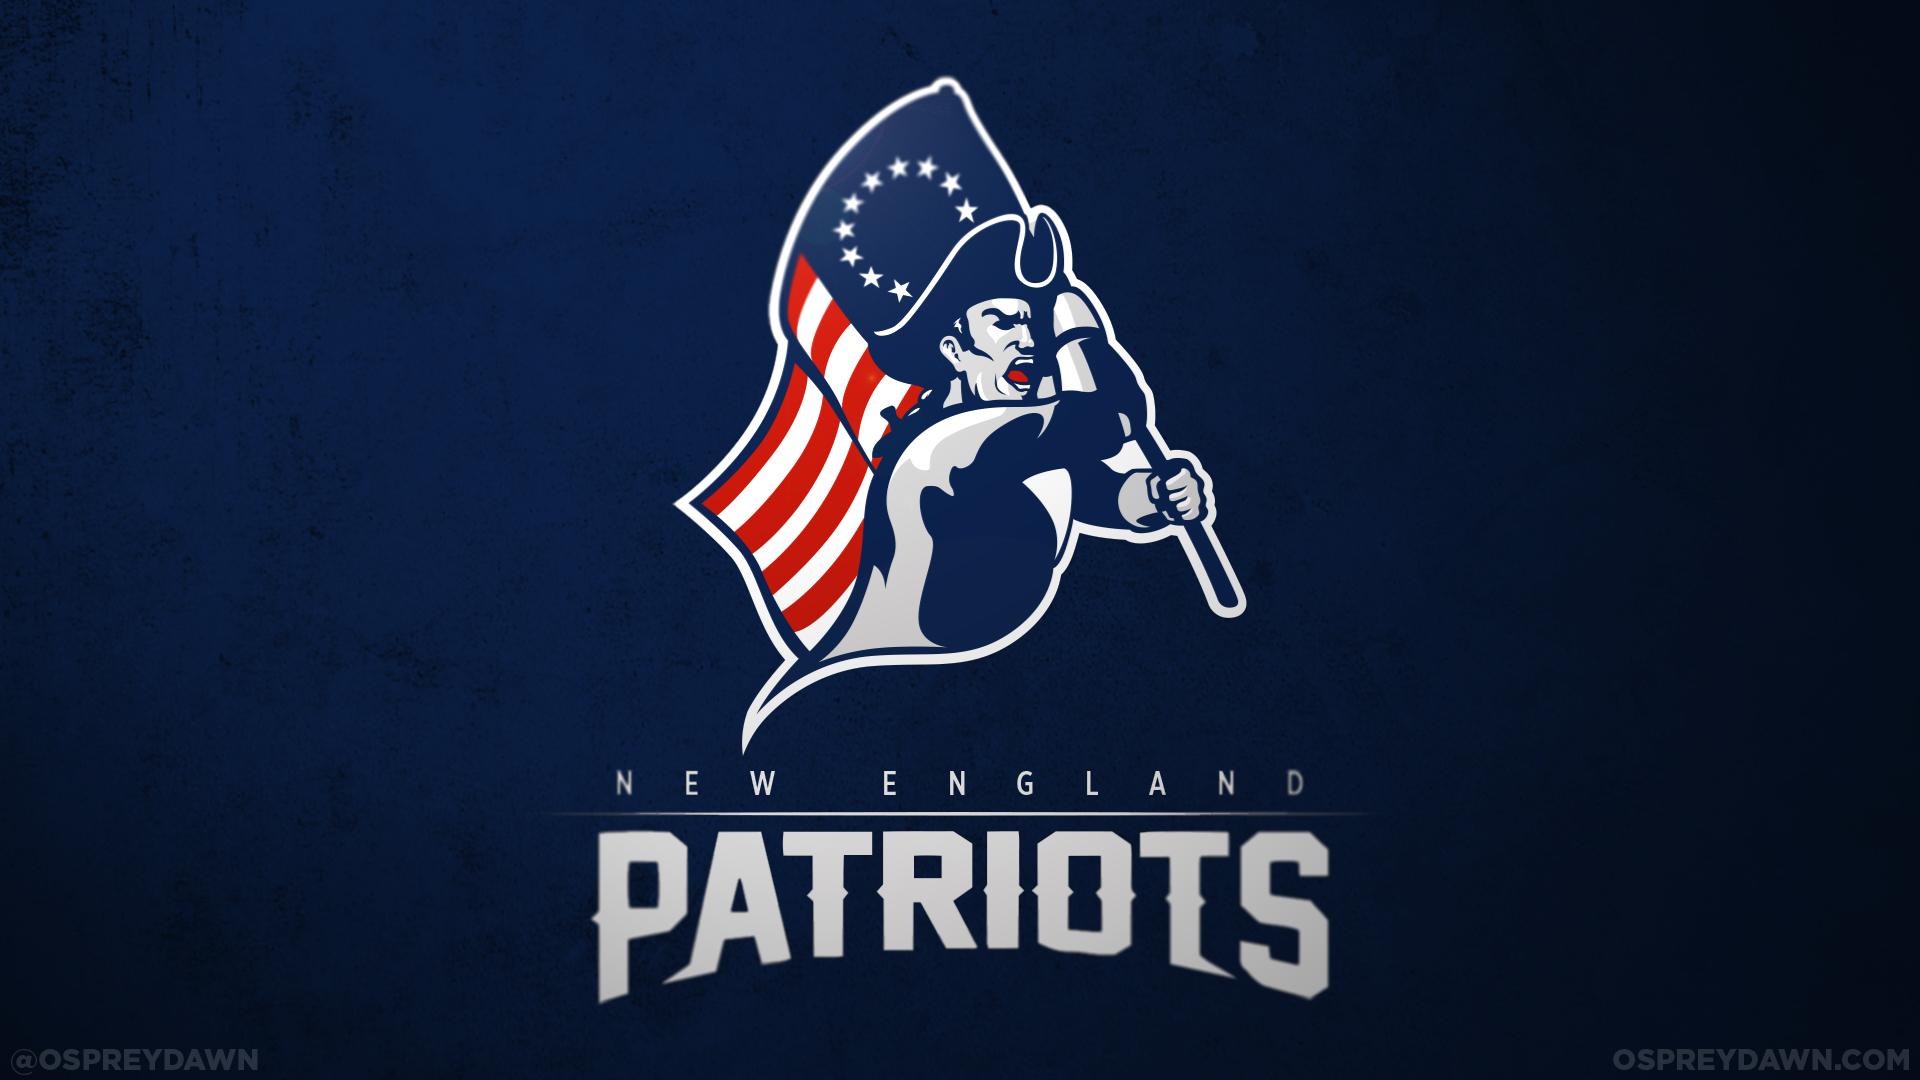 The New England Patriots 1920x1080